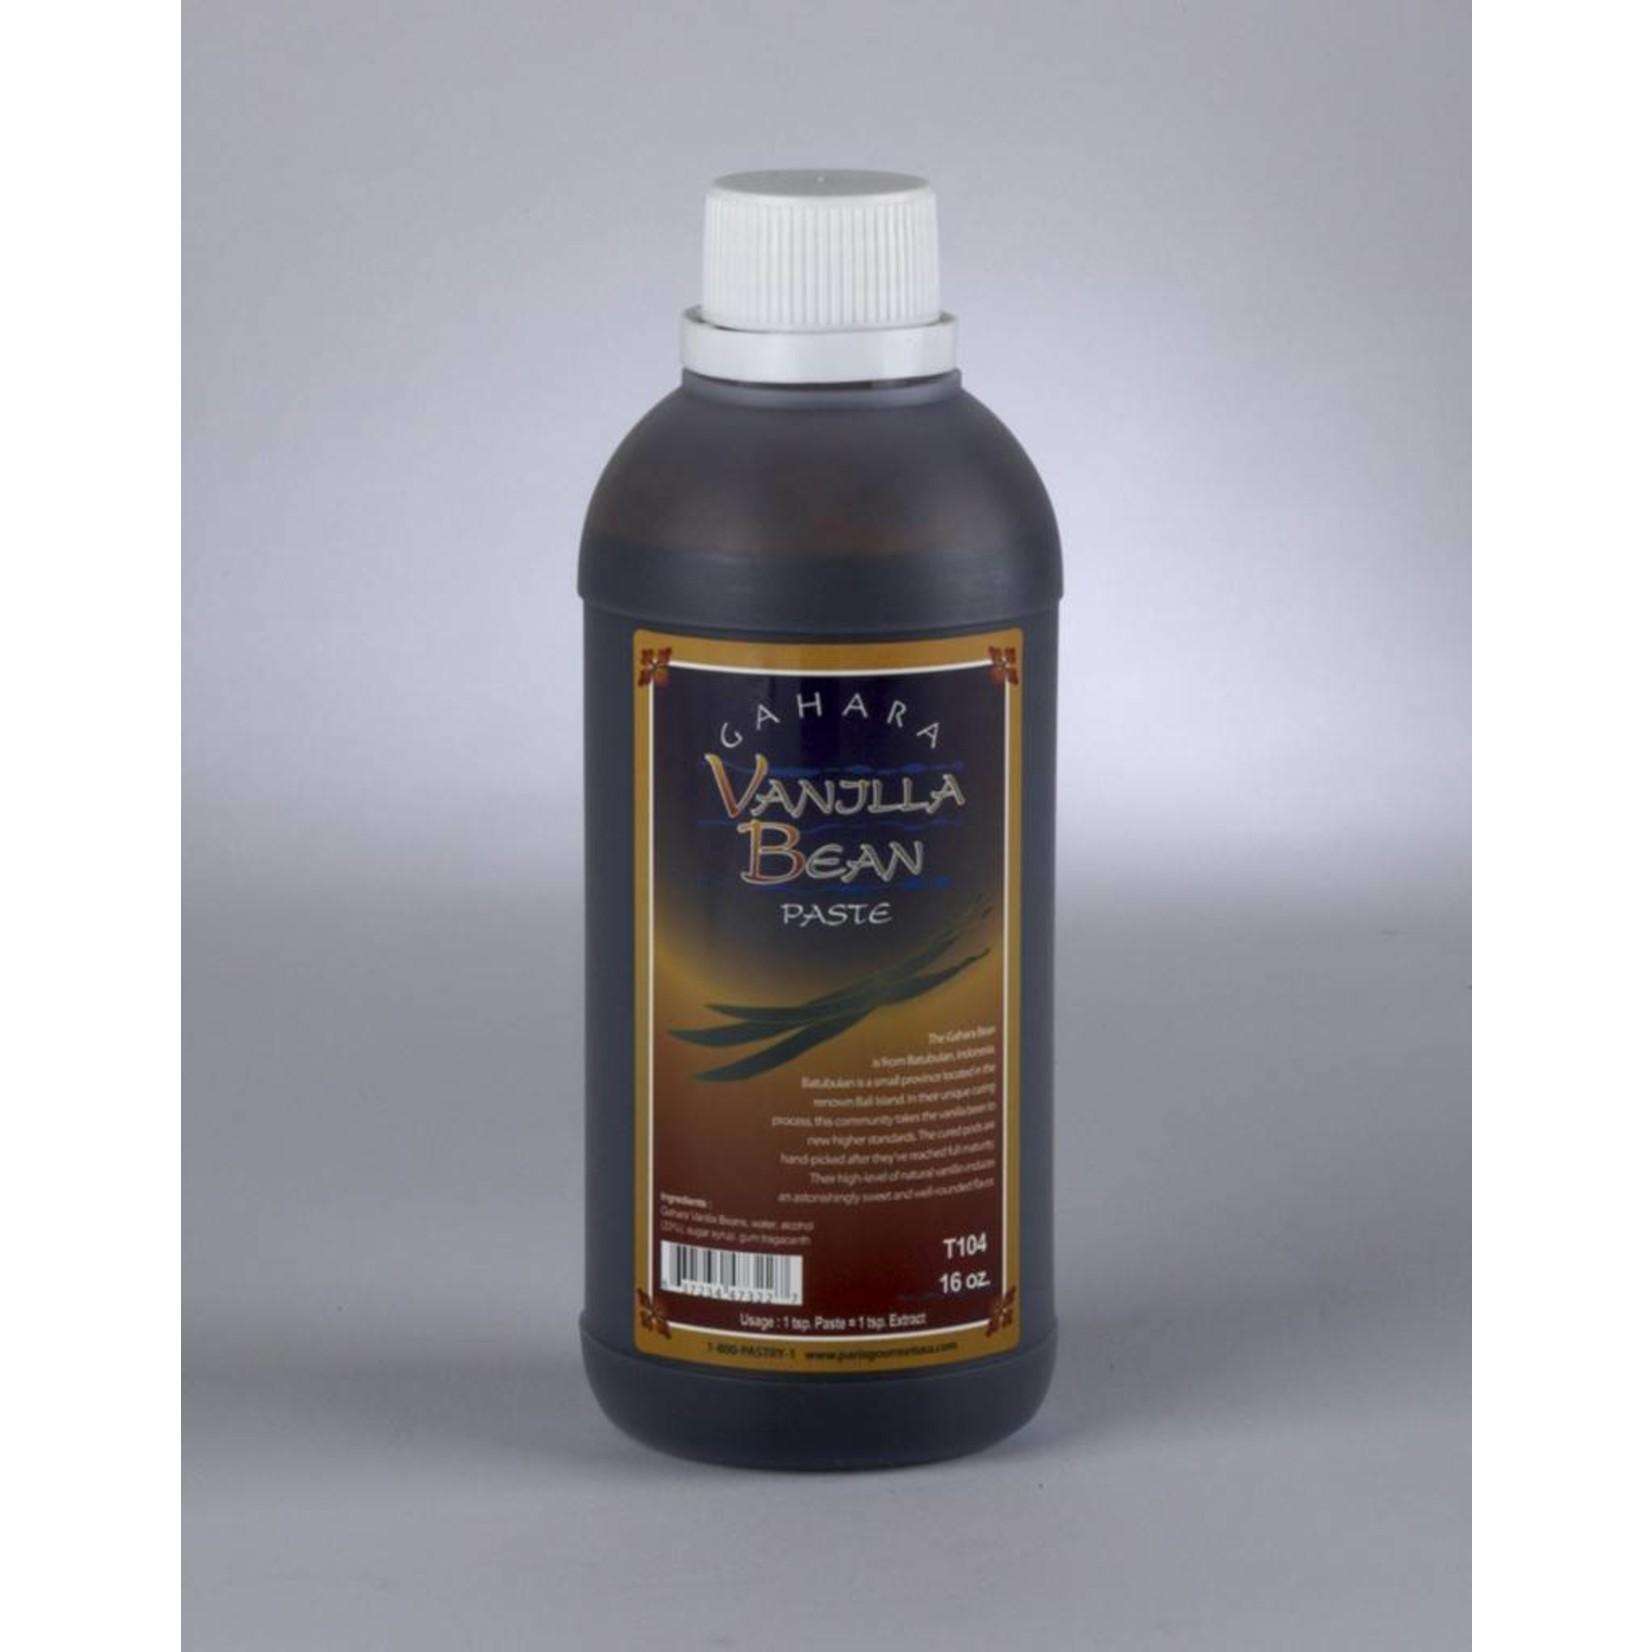 Gahara Gahara - Vanilla Bean paste - 16oz, T104